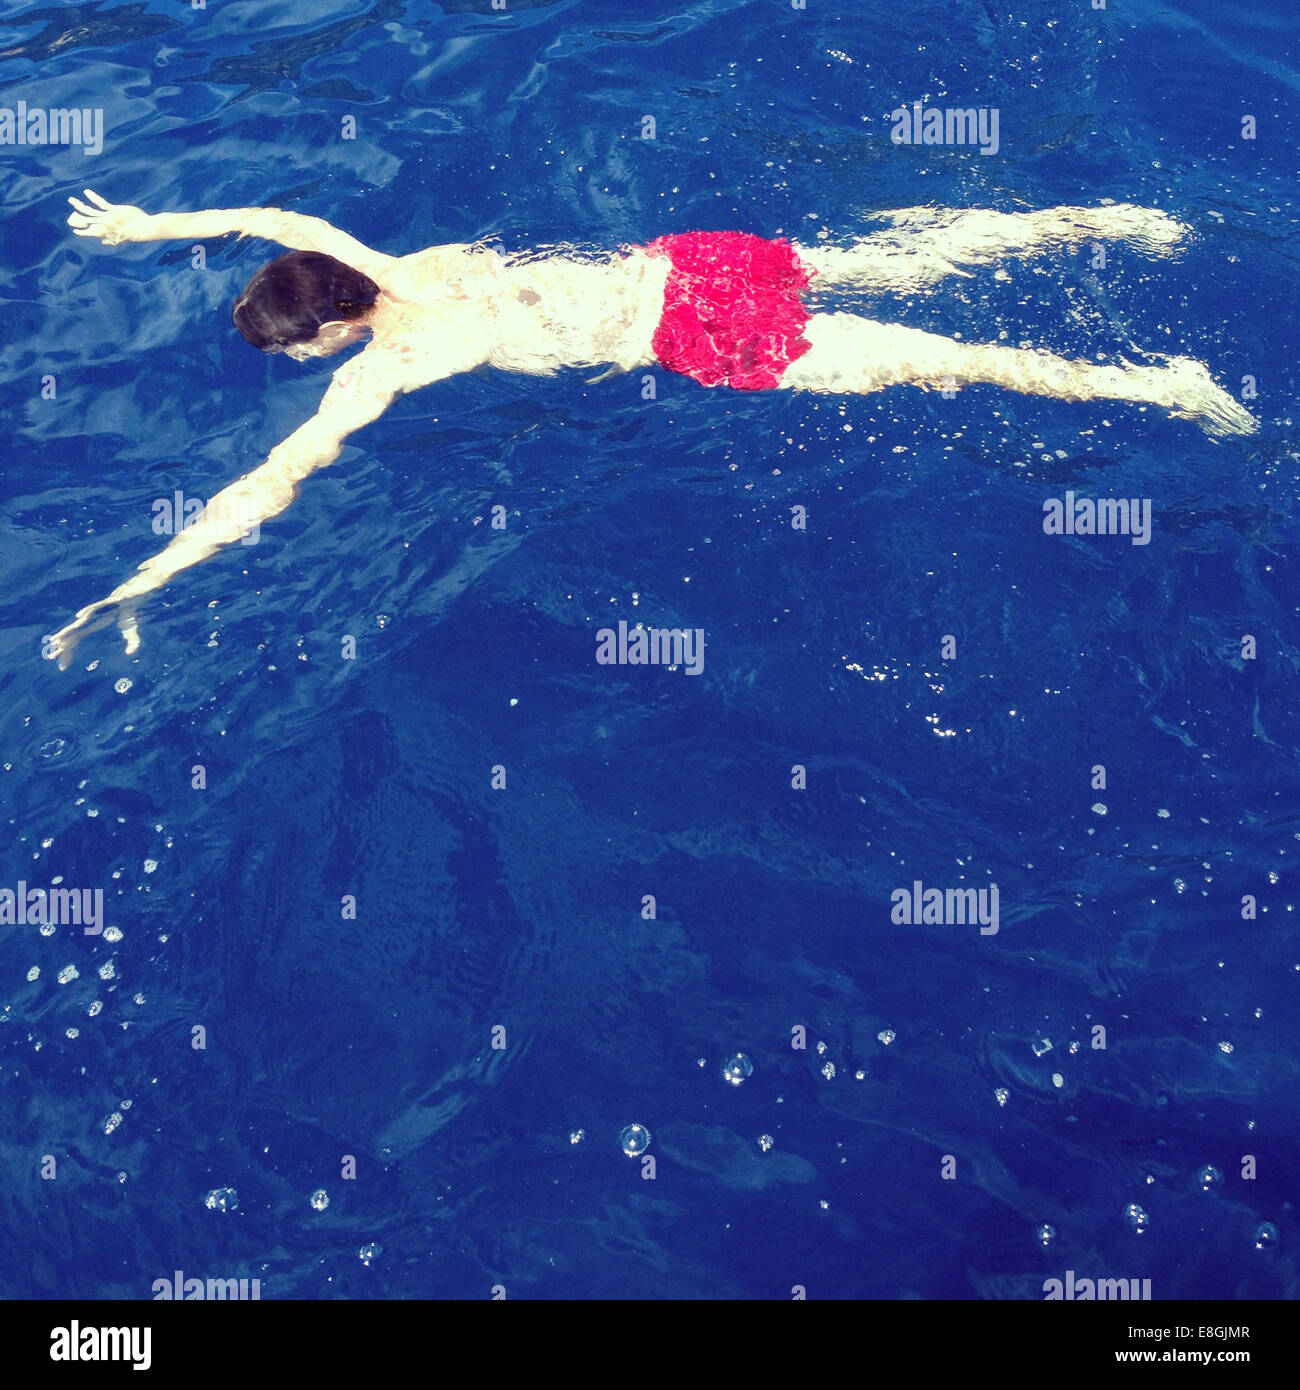 Mann, Schwimmen im Meer verdeckt Stockbild